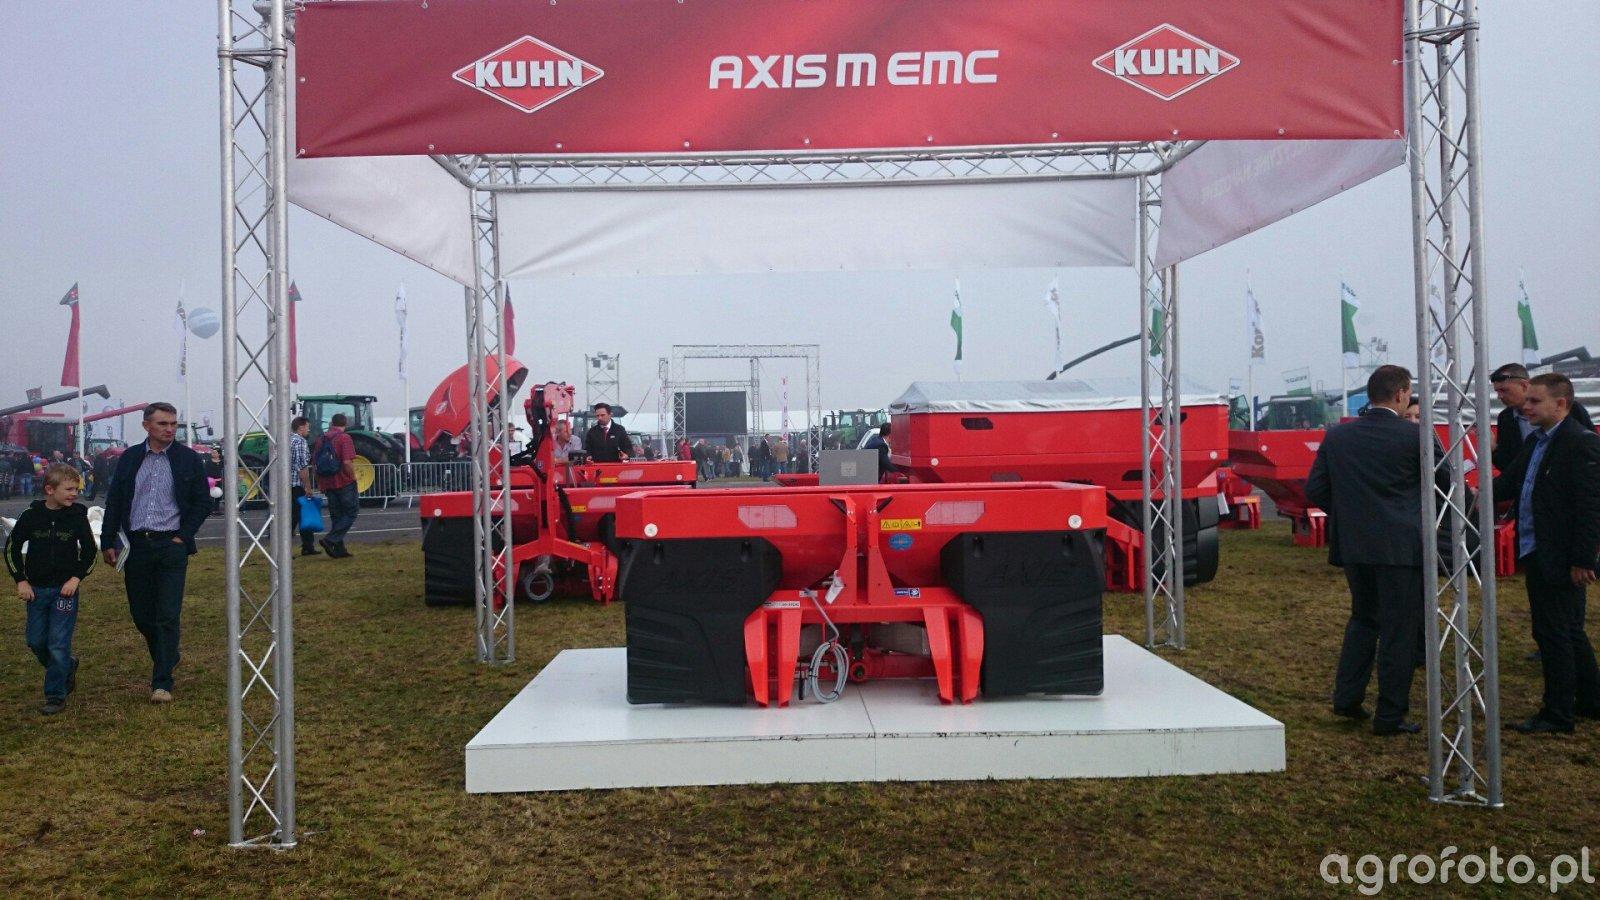 Axis m emc